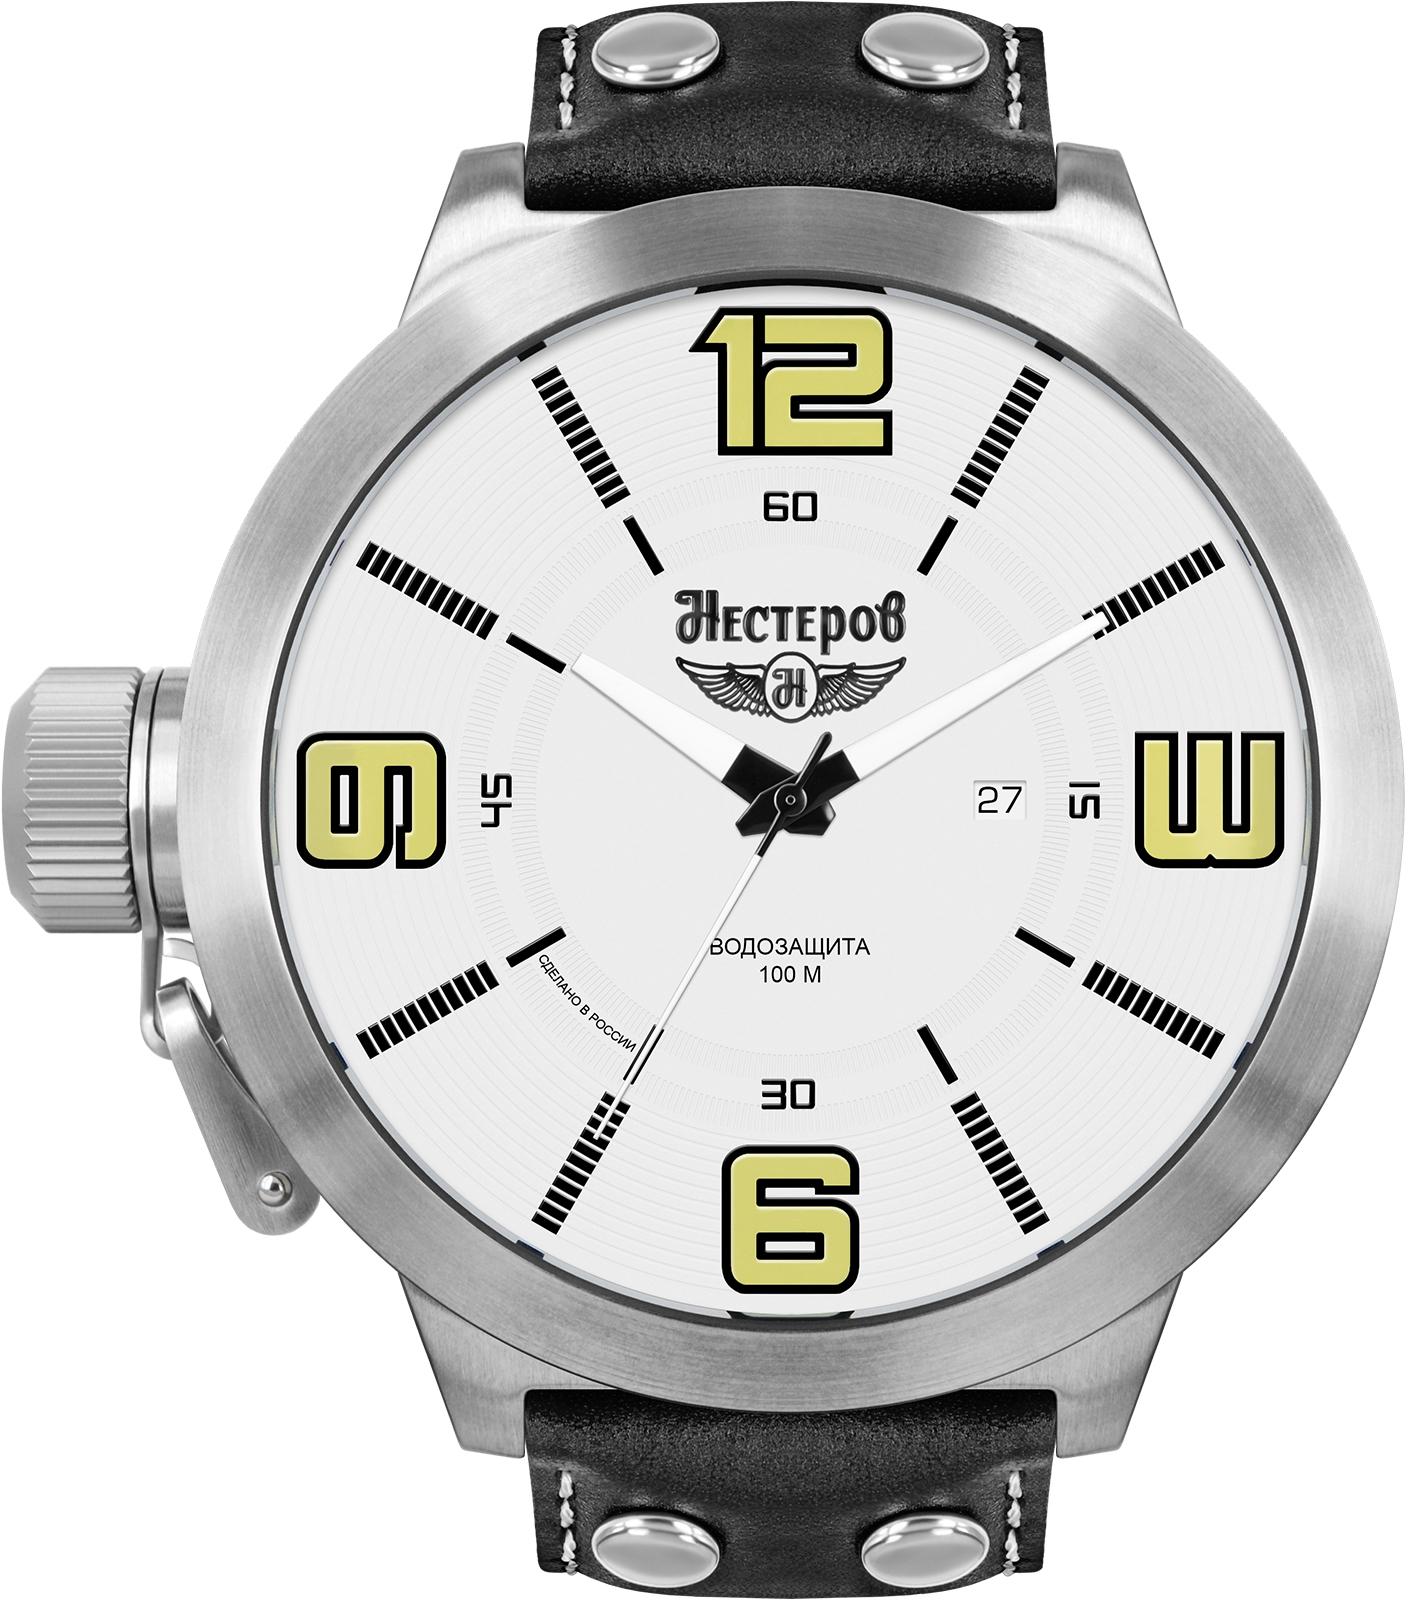 Наручные часы Нестеров H0943B02-05A наручные мужские часы тяжелые